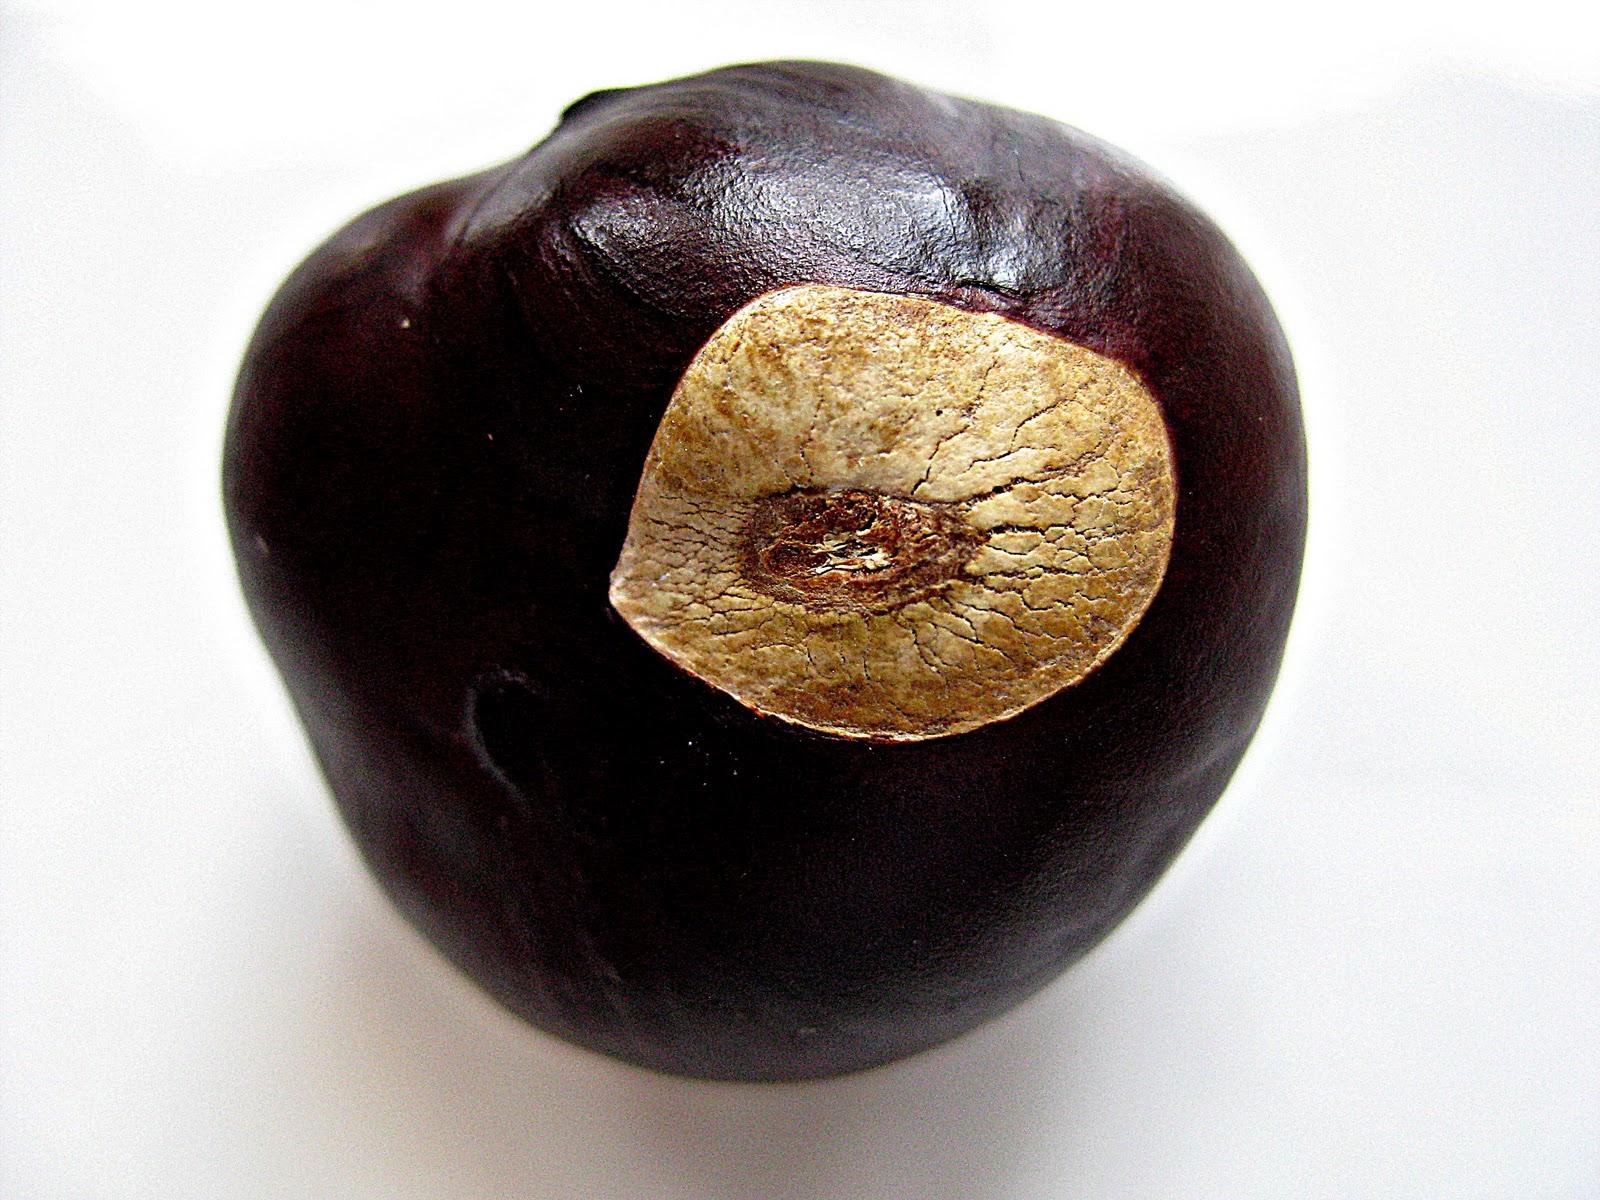 how to grow a buckeye tree from a nut